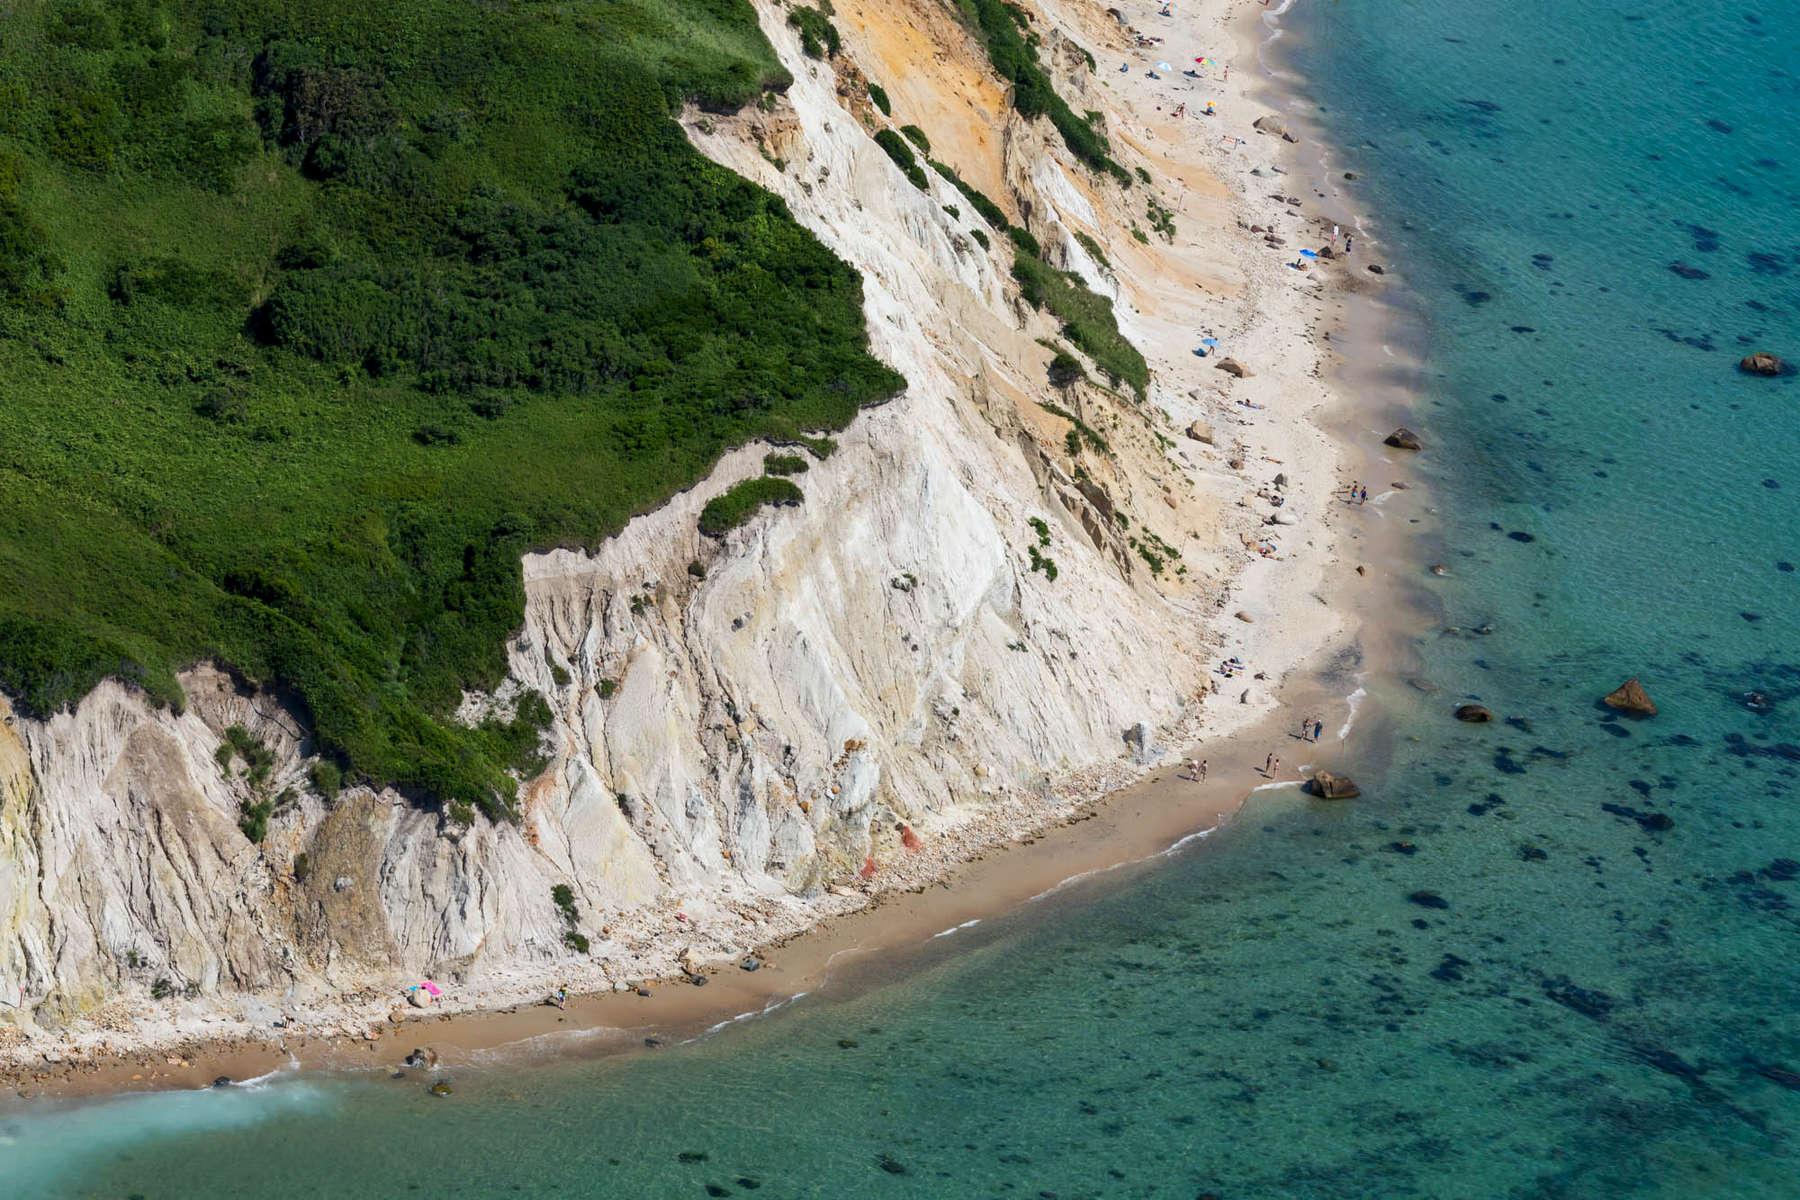 Eroding Clay Cliffs Undercut Topside Vegetation, Aquinnah, MA 2013 (130717-0075)beach, erosion, water, sea, ocean, sand, dune, cape cod, nantucket, marthas vineyard, new england, blue, green